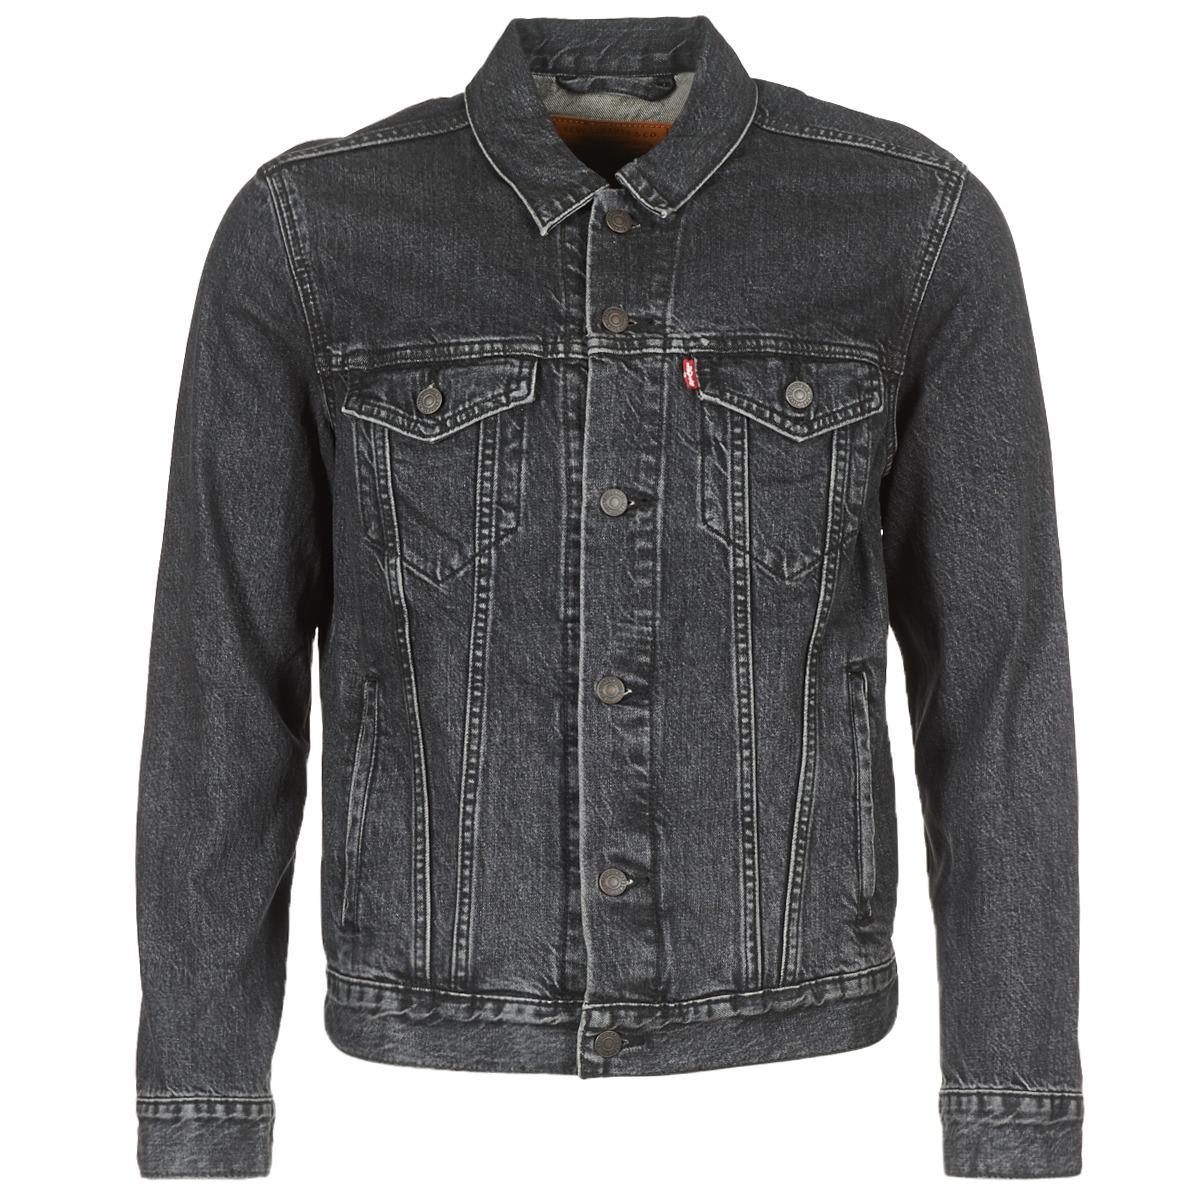 levi 39 s levis the trucker jacket men 39 s denim jacket in black in black for men save 27 lyst